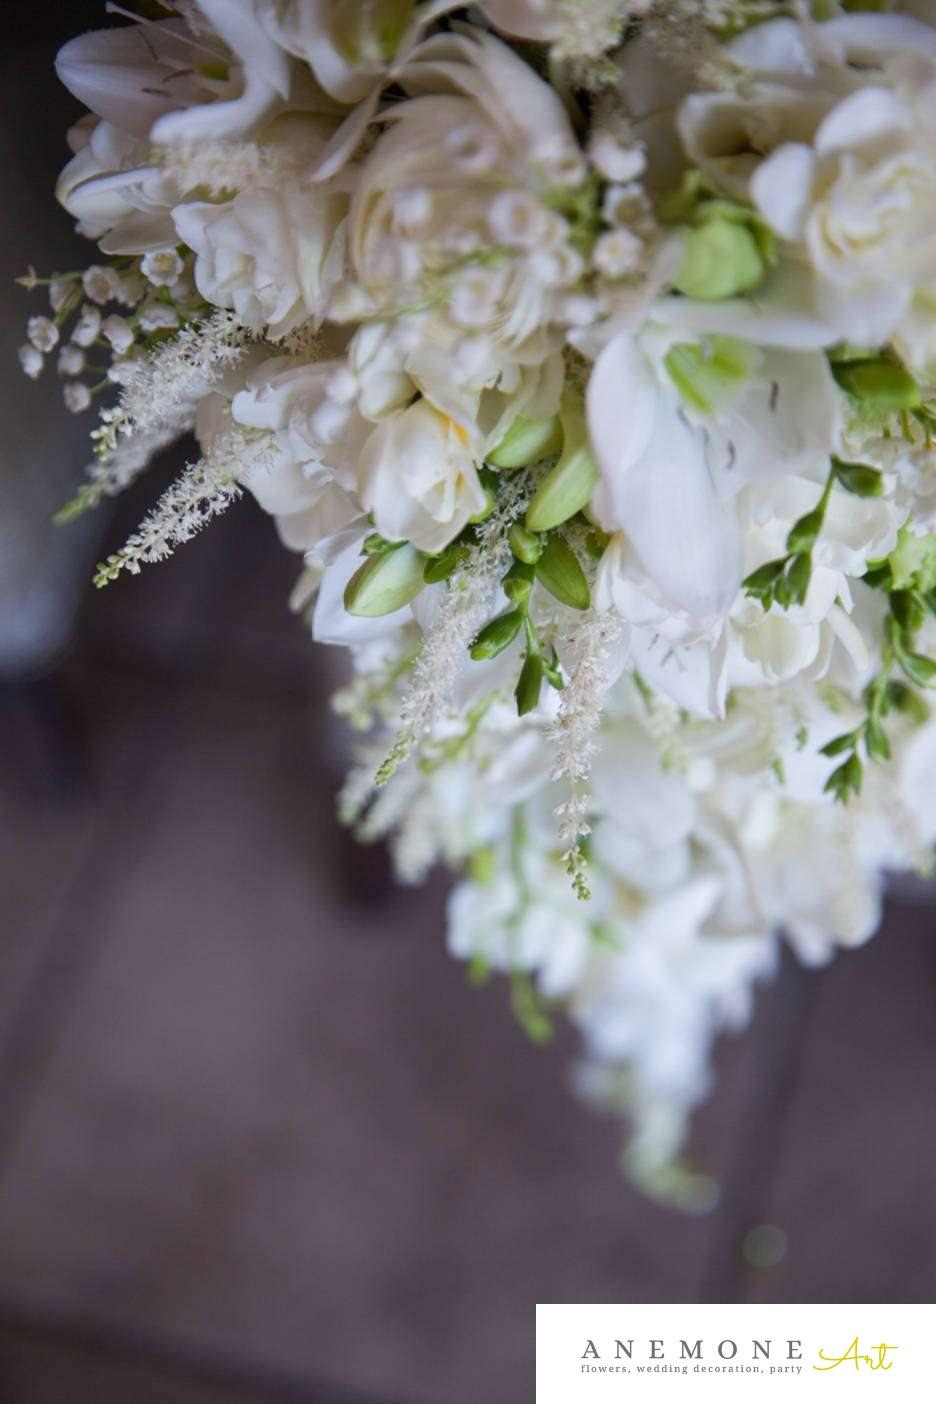 Poza, foto cu Flori de nunta alb, buchet mireasa, curgator, frezii, lacrimioare, orhidee, trandafiri in Arad, Timisoara, Oradea (wedding flowers, bouquets) nunta Arad, Timisoara, Oradea